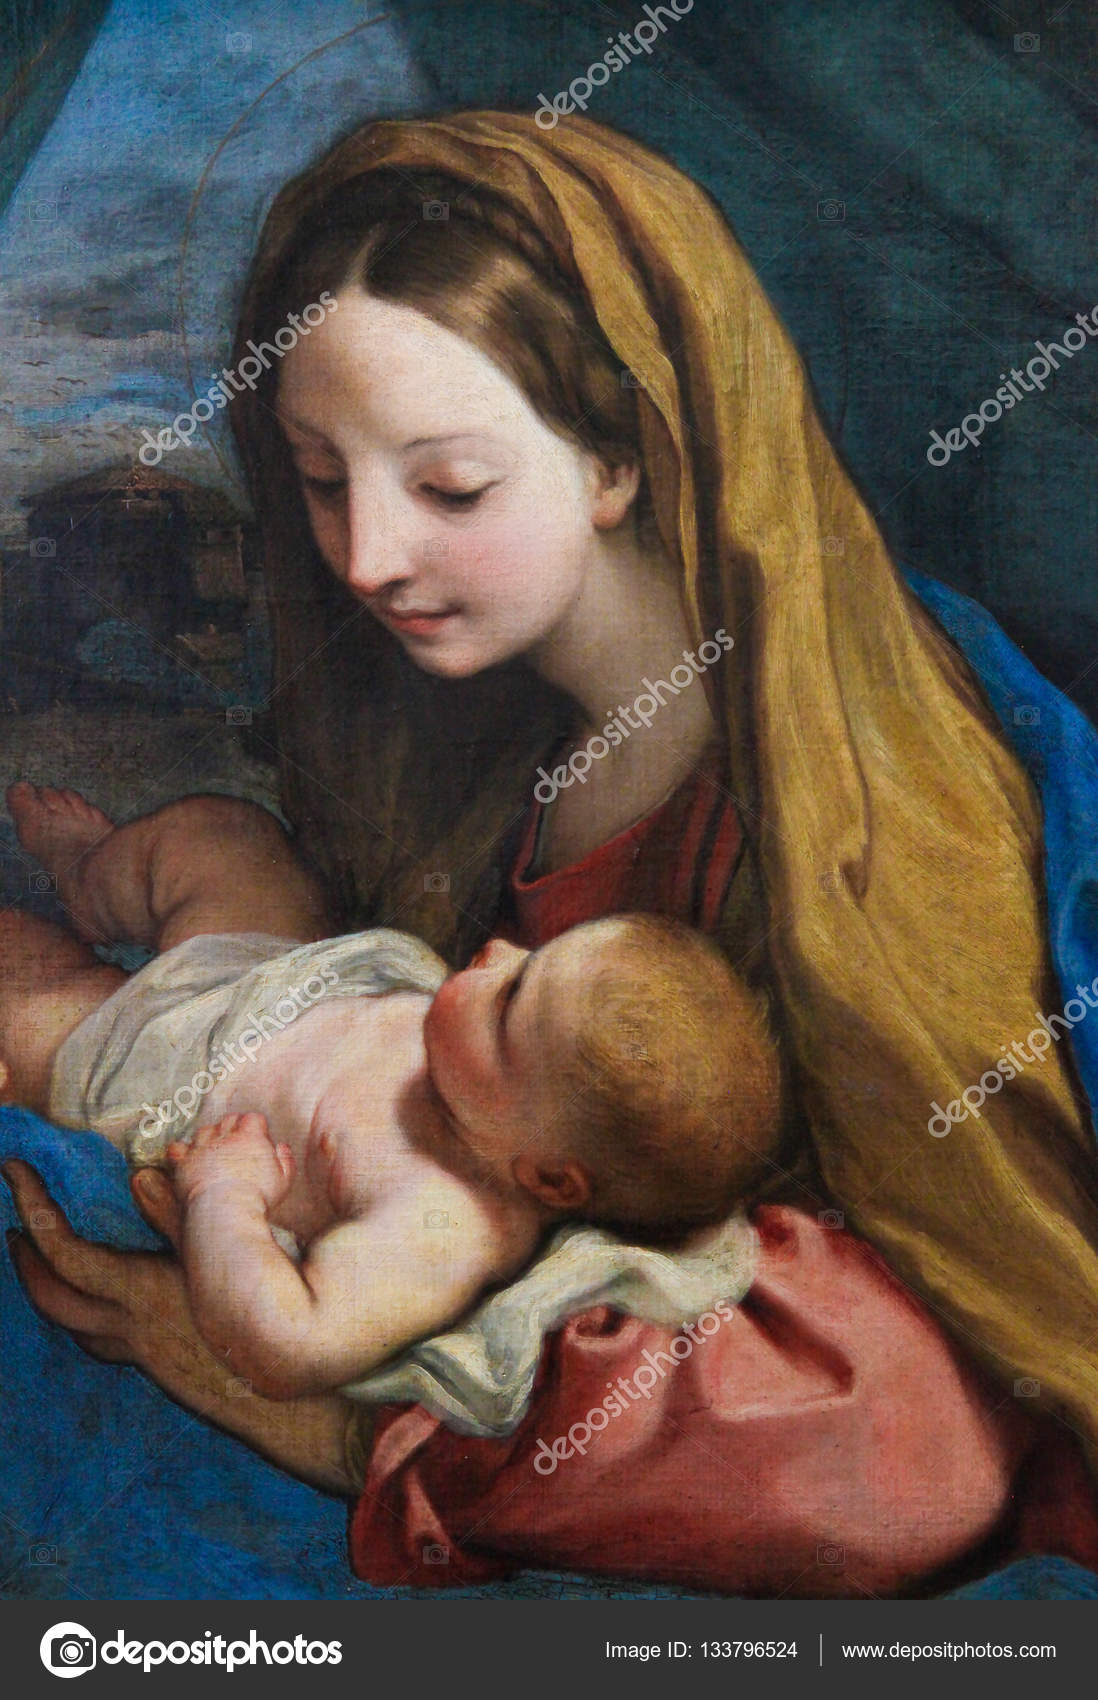 mother mary and child jesus stock editorial photo jorisvo 133796524